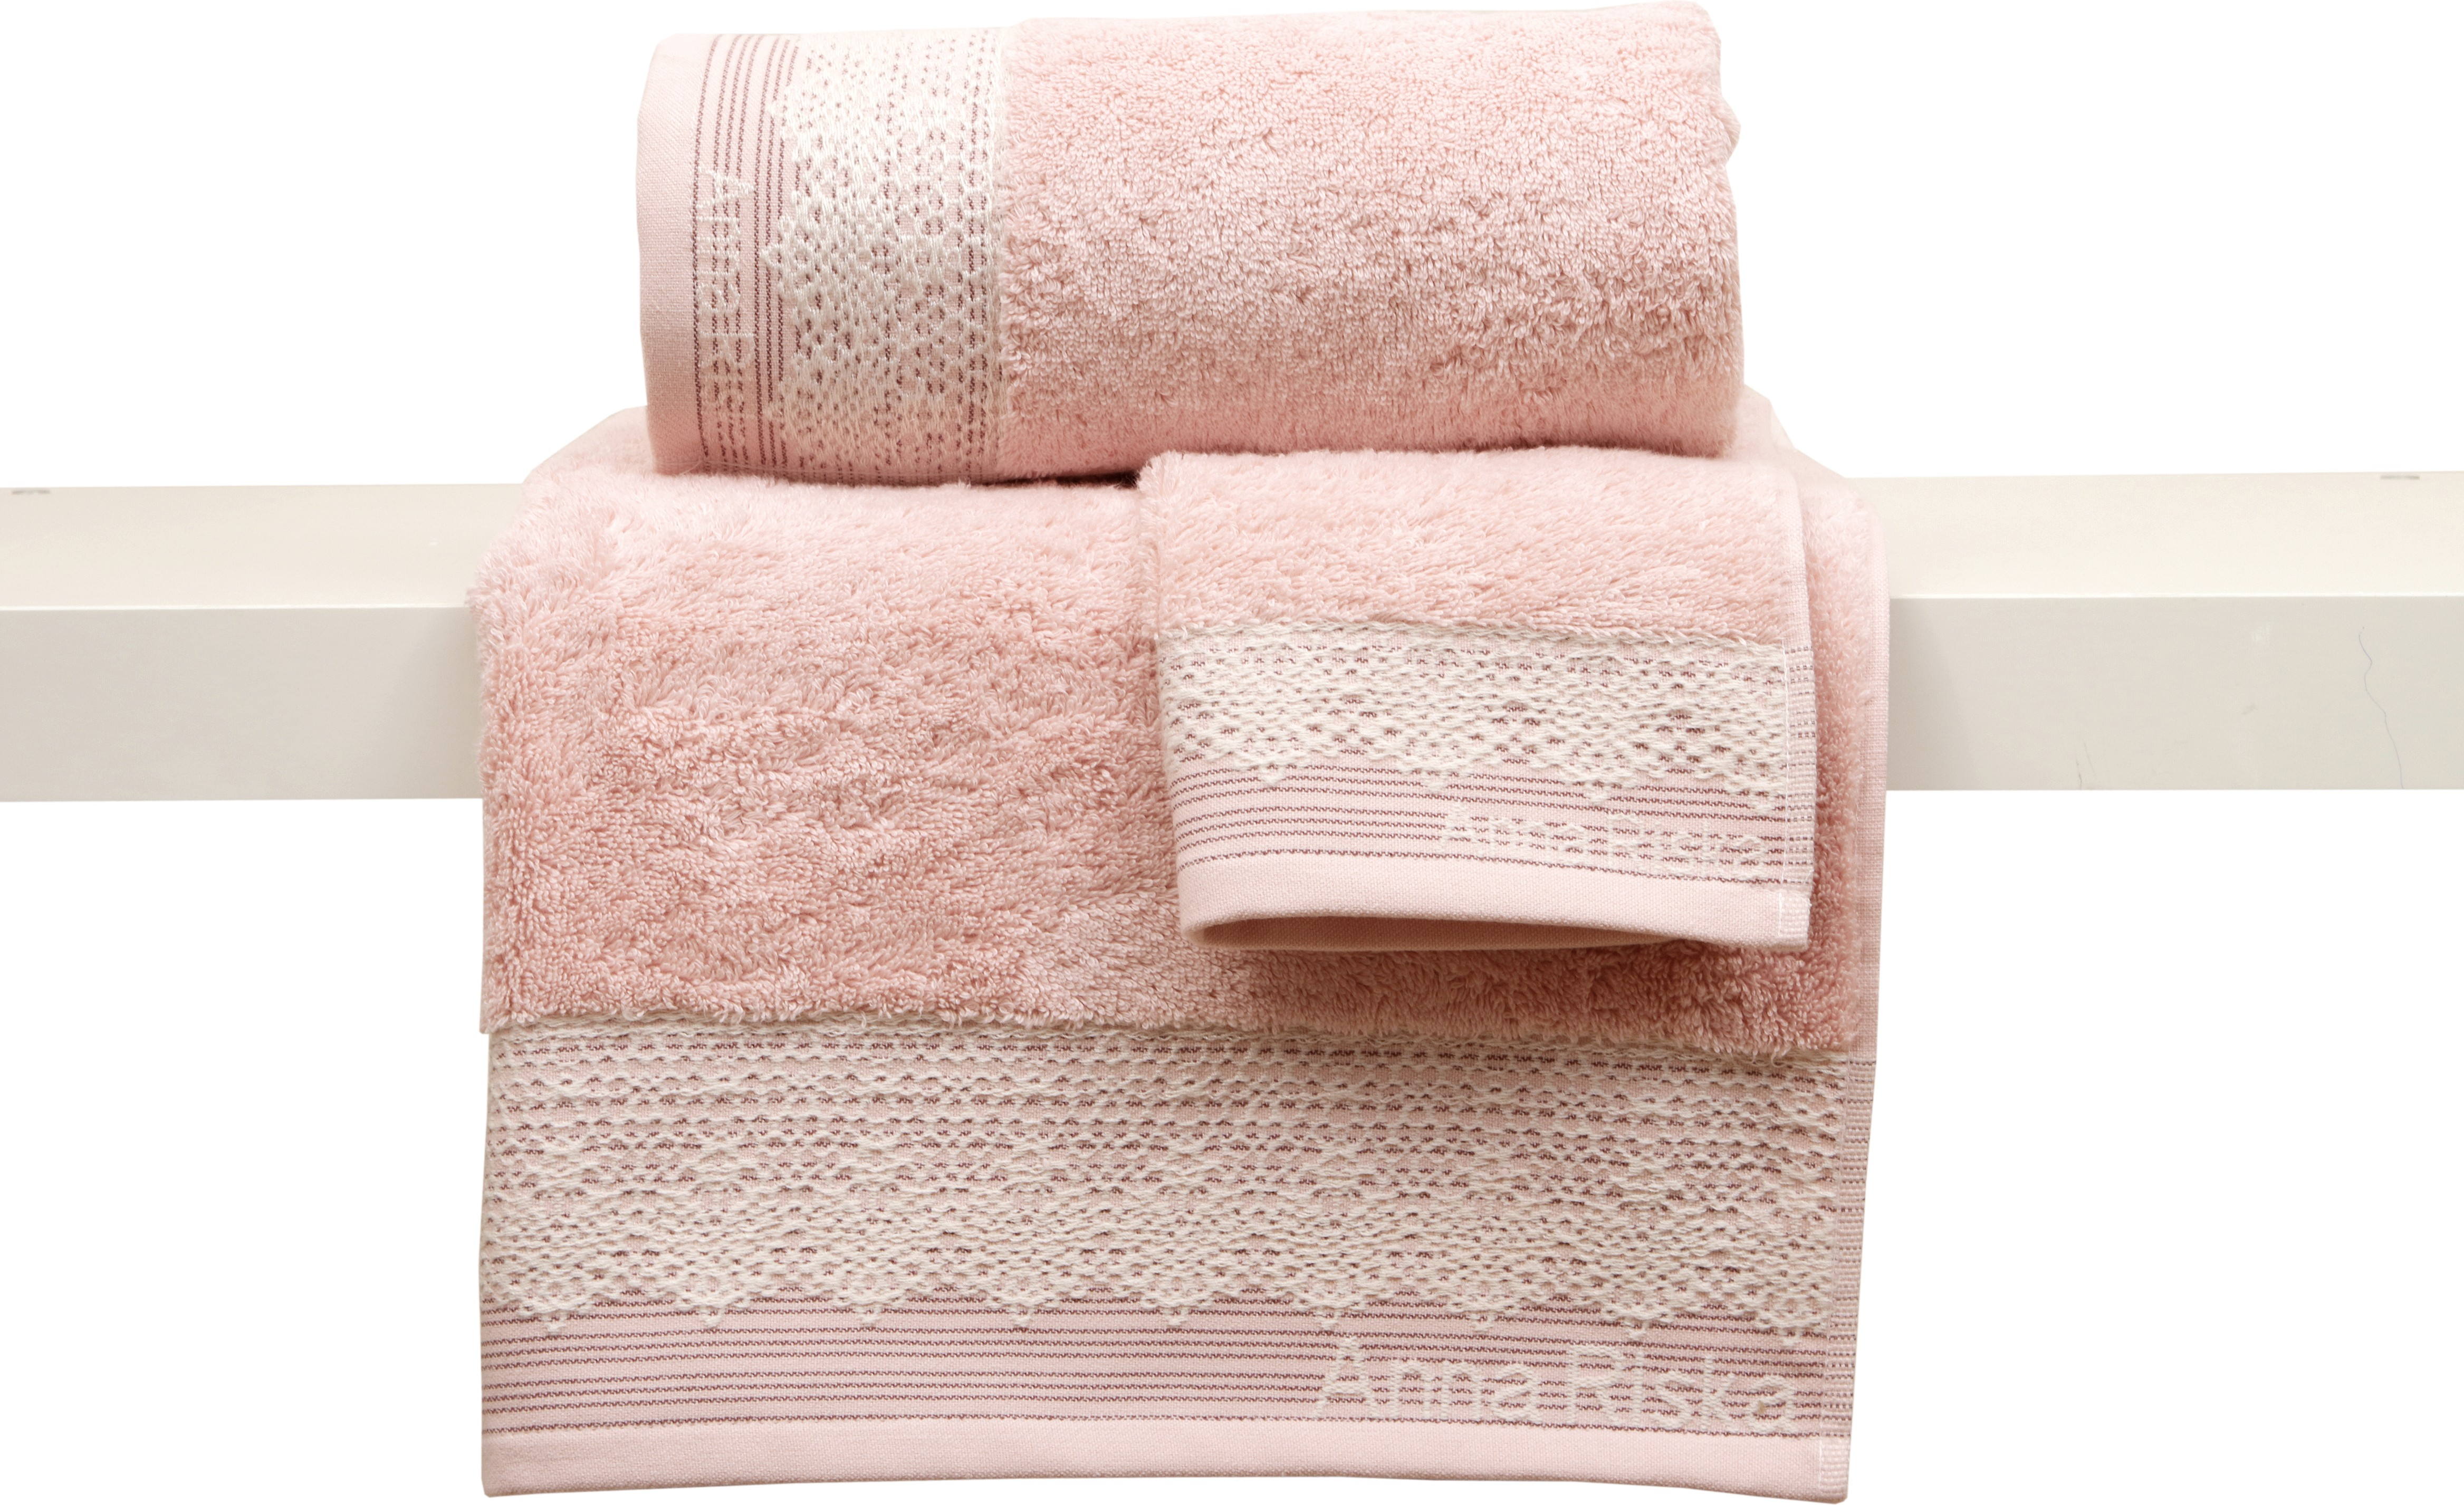 Anna Riska Σετ 3 Πετσέτες 30x50 Συσκευασία Κορδέλα Karla 1 Blush Pink